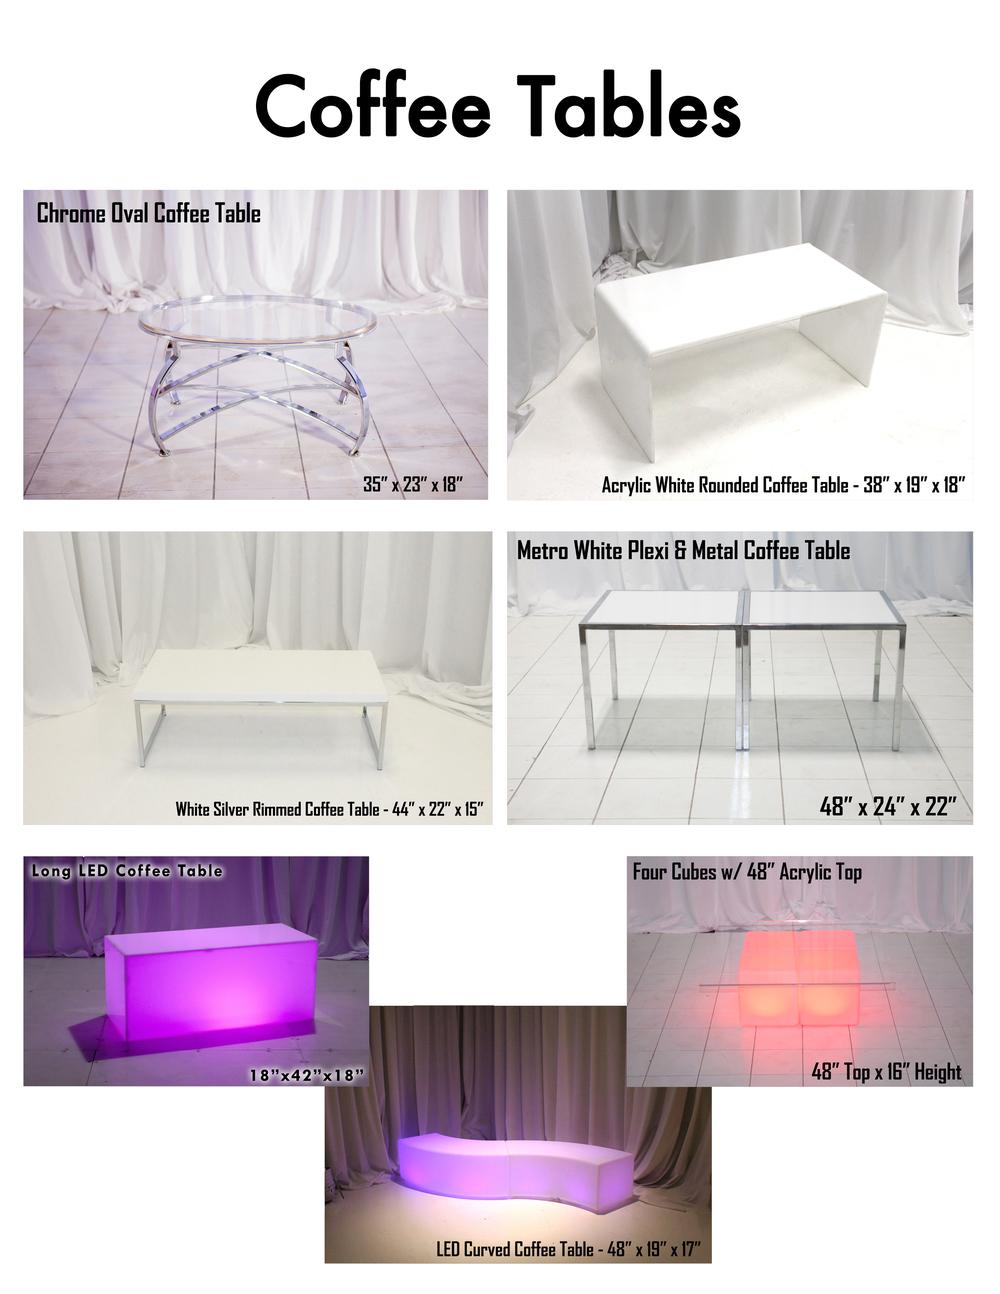 P42_Coffee Tables.jpg